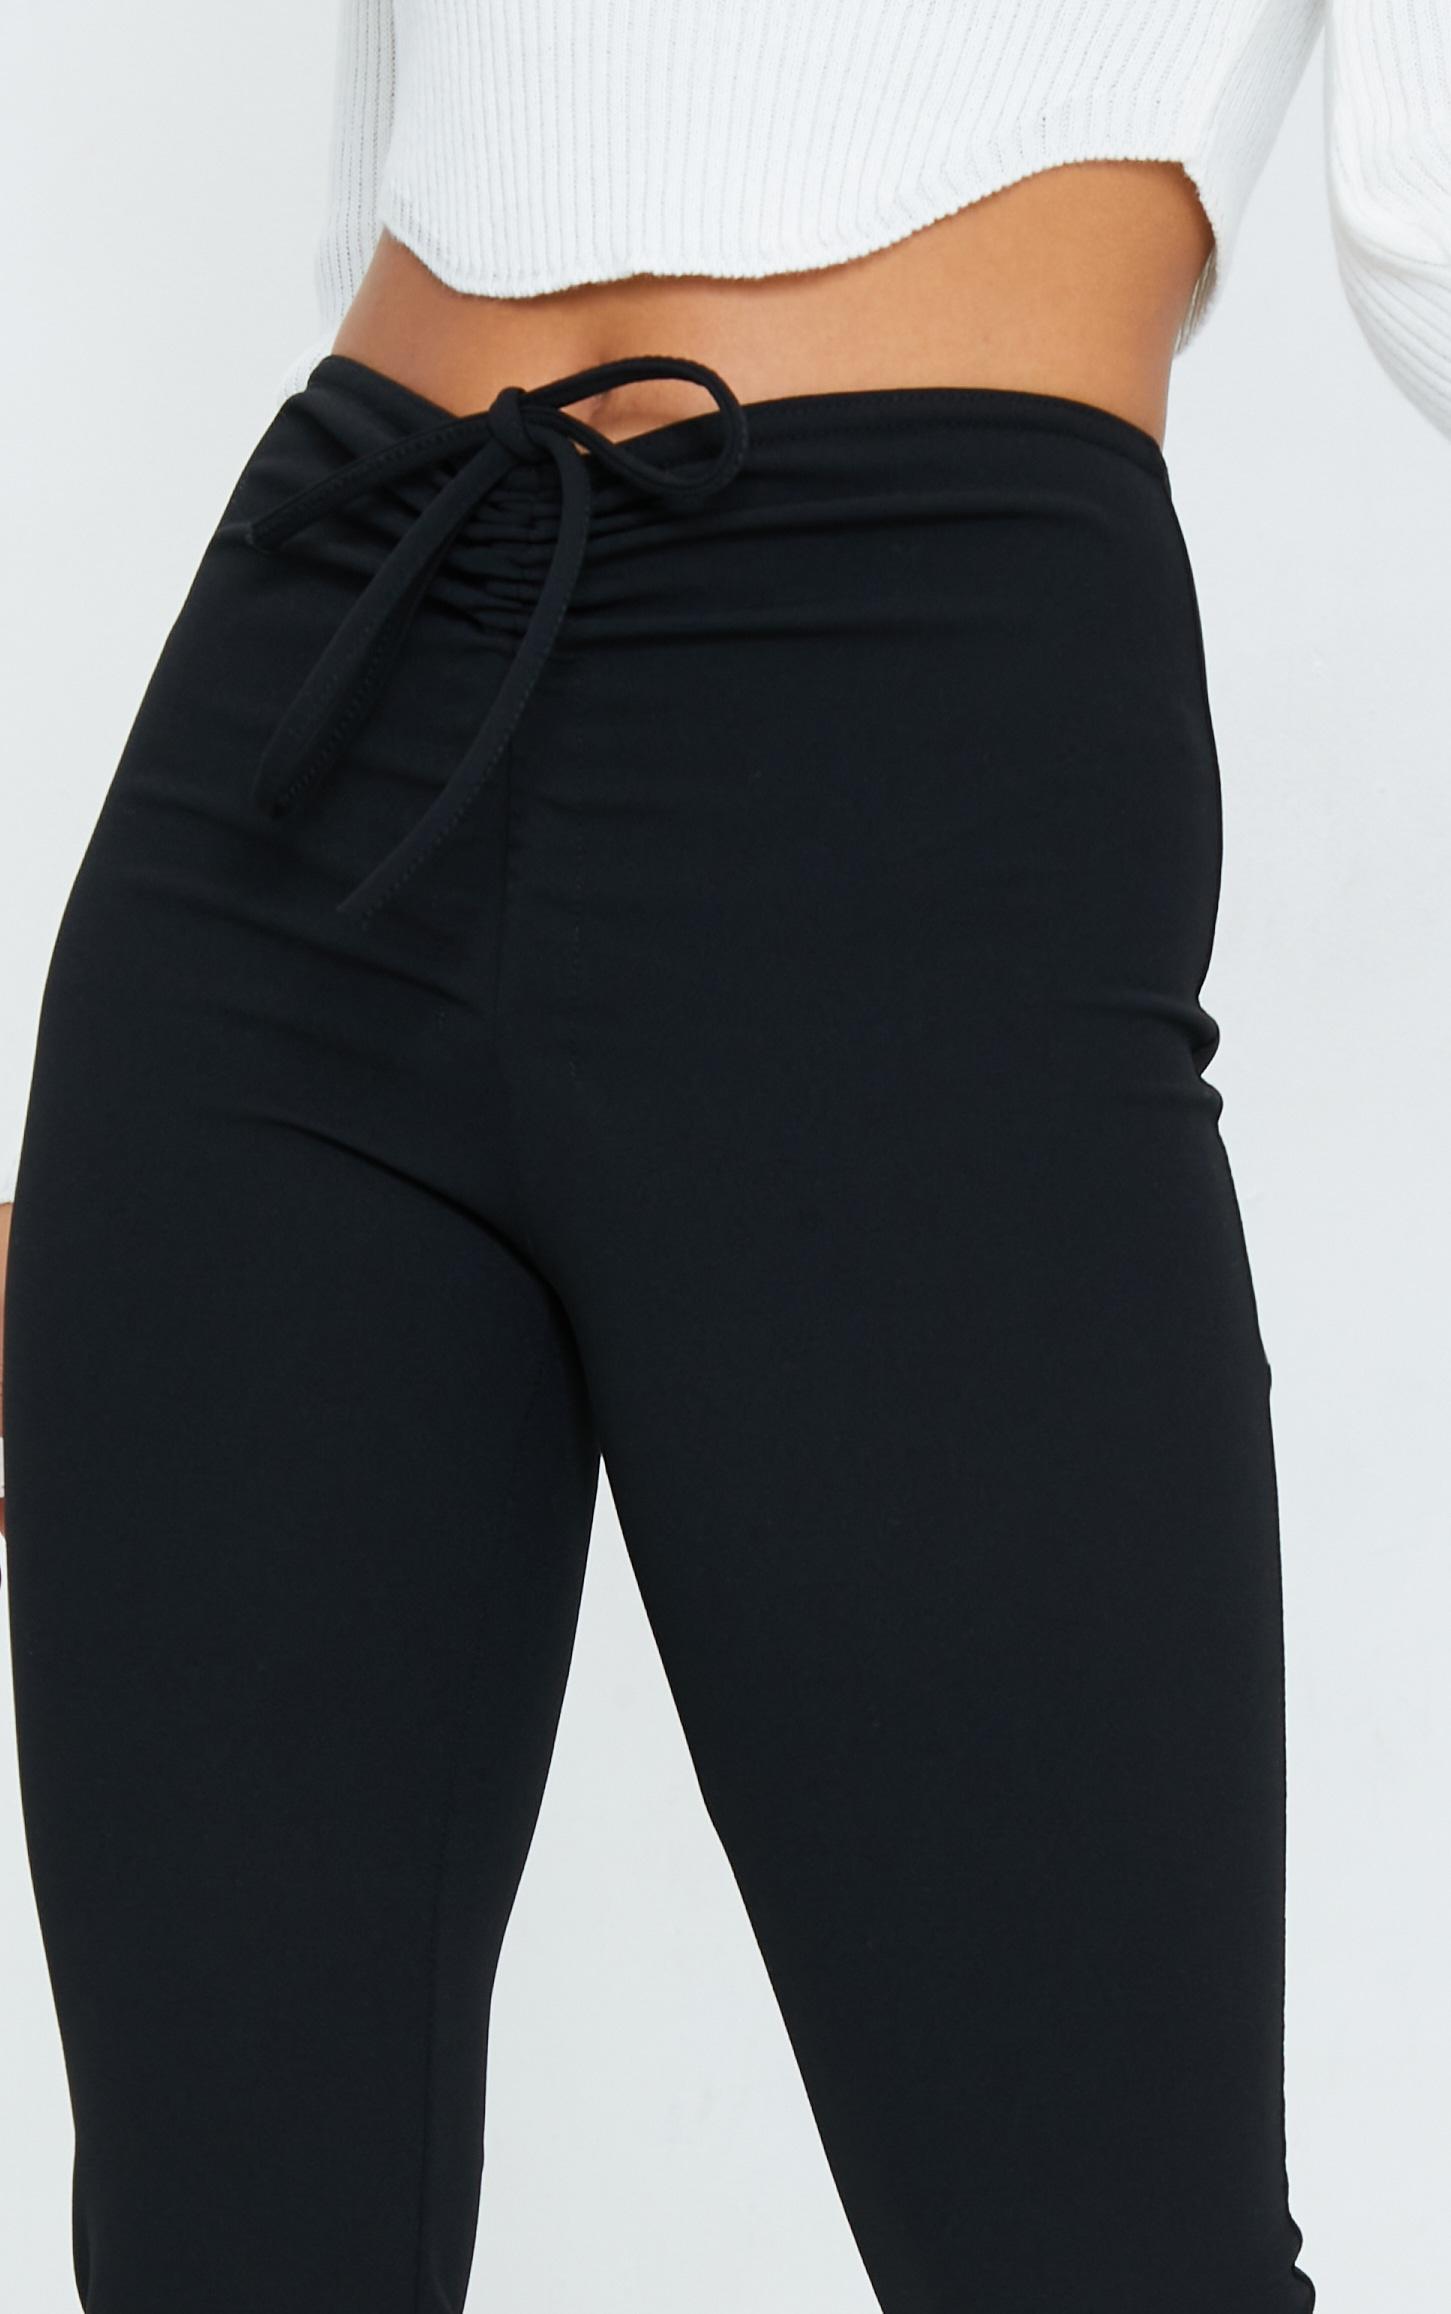 Petite Black Crepe Ruched Waist Line Split Hem Pants 4